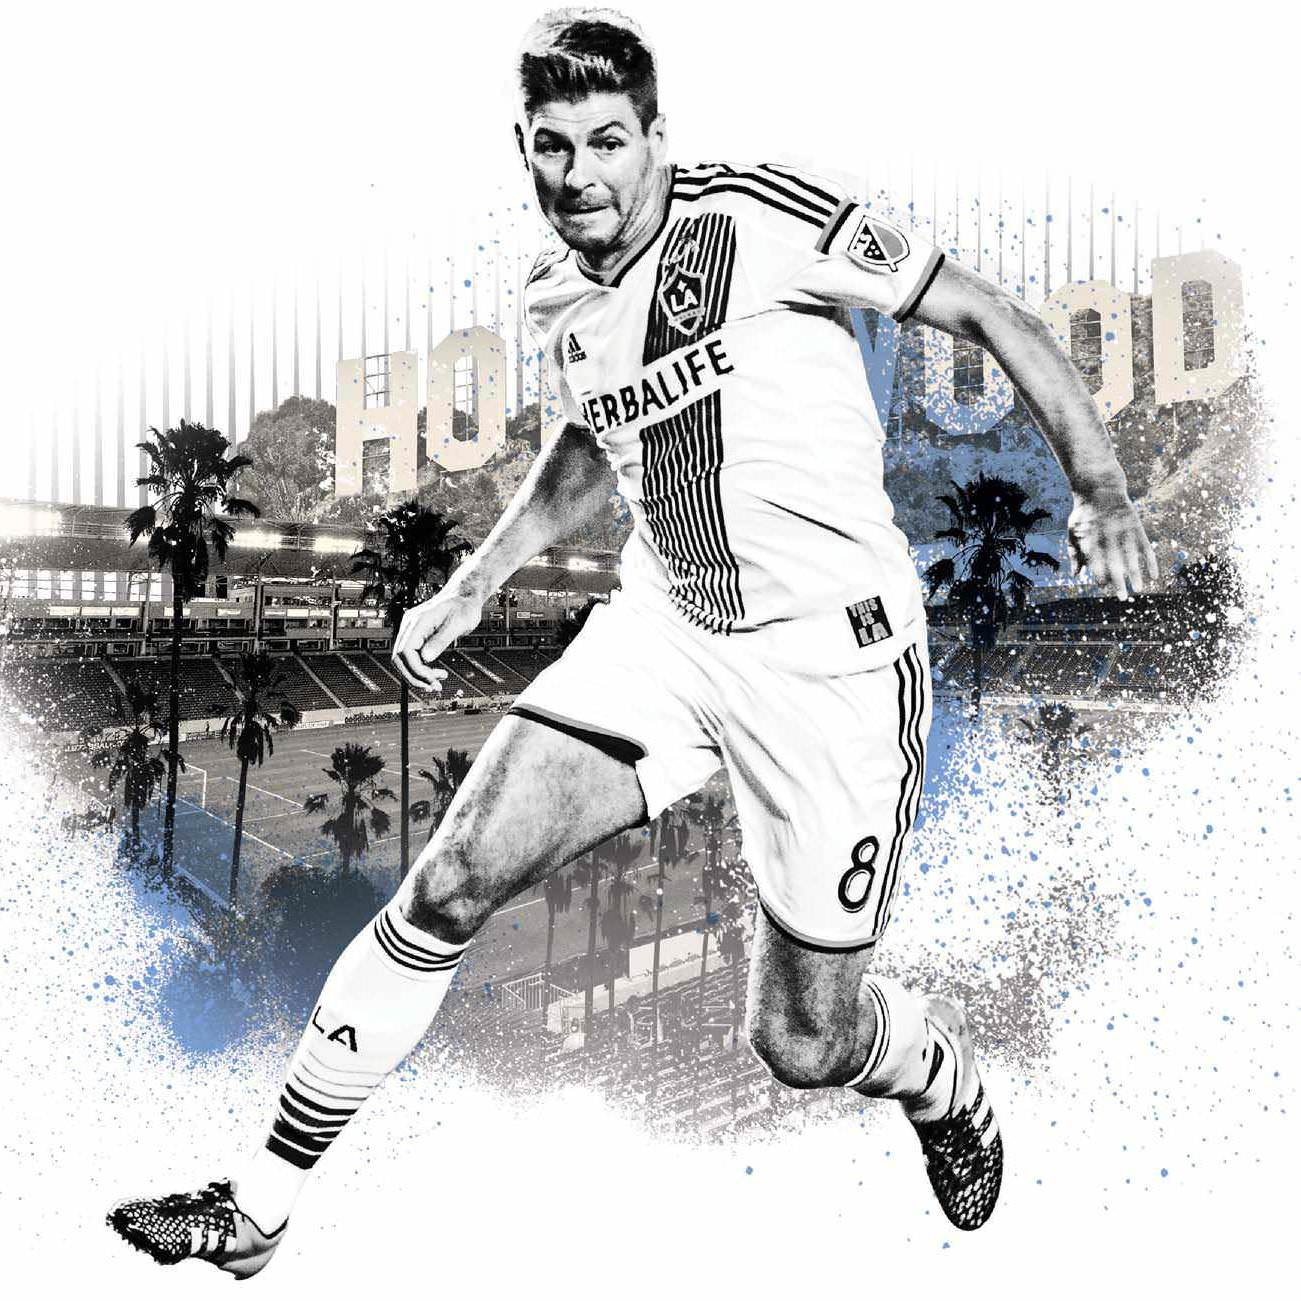 Steven Gerrard Is Out To Prove Himself In LA